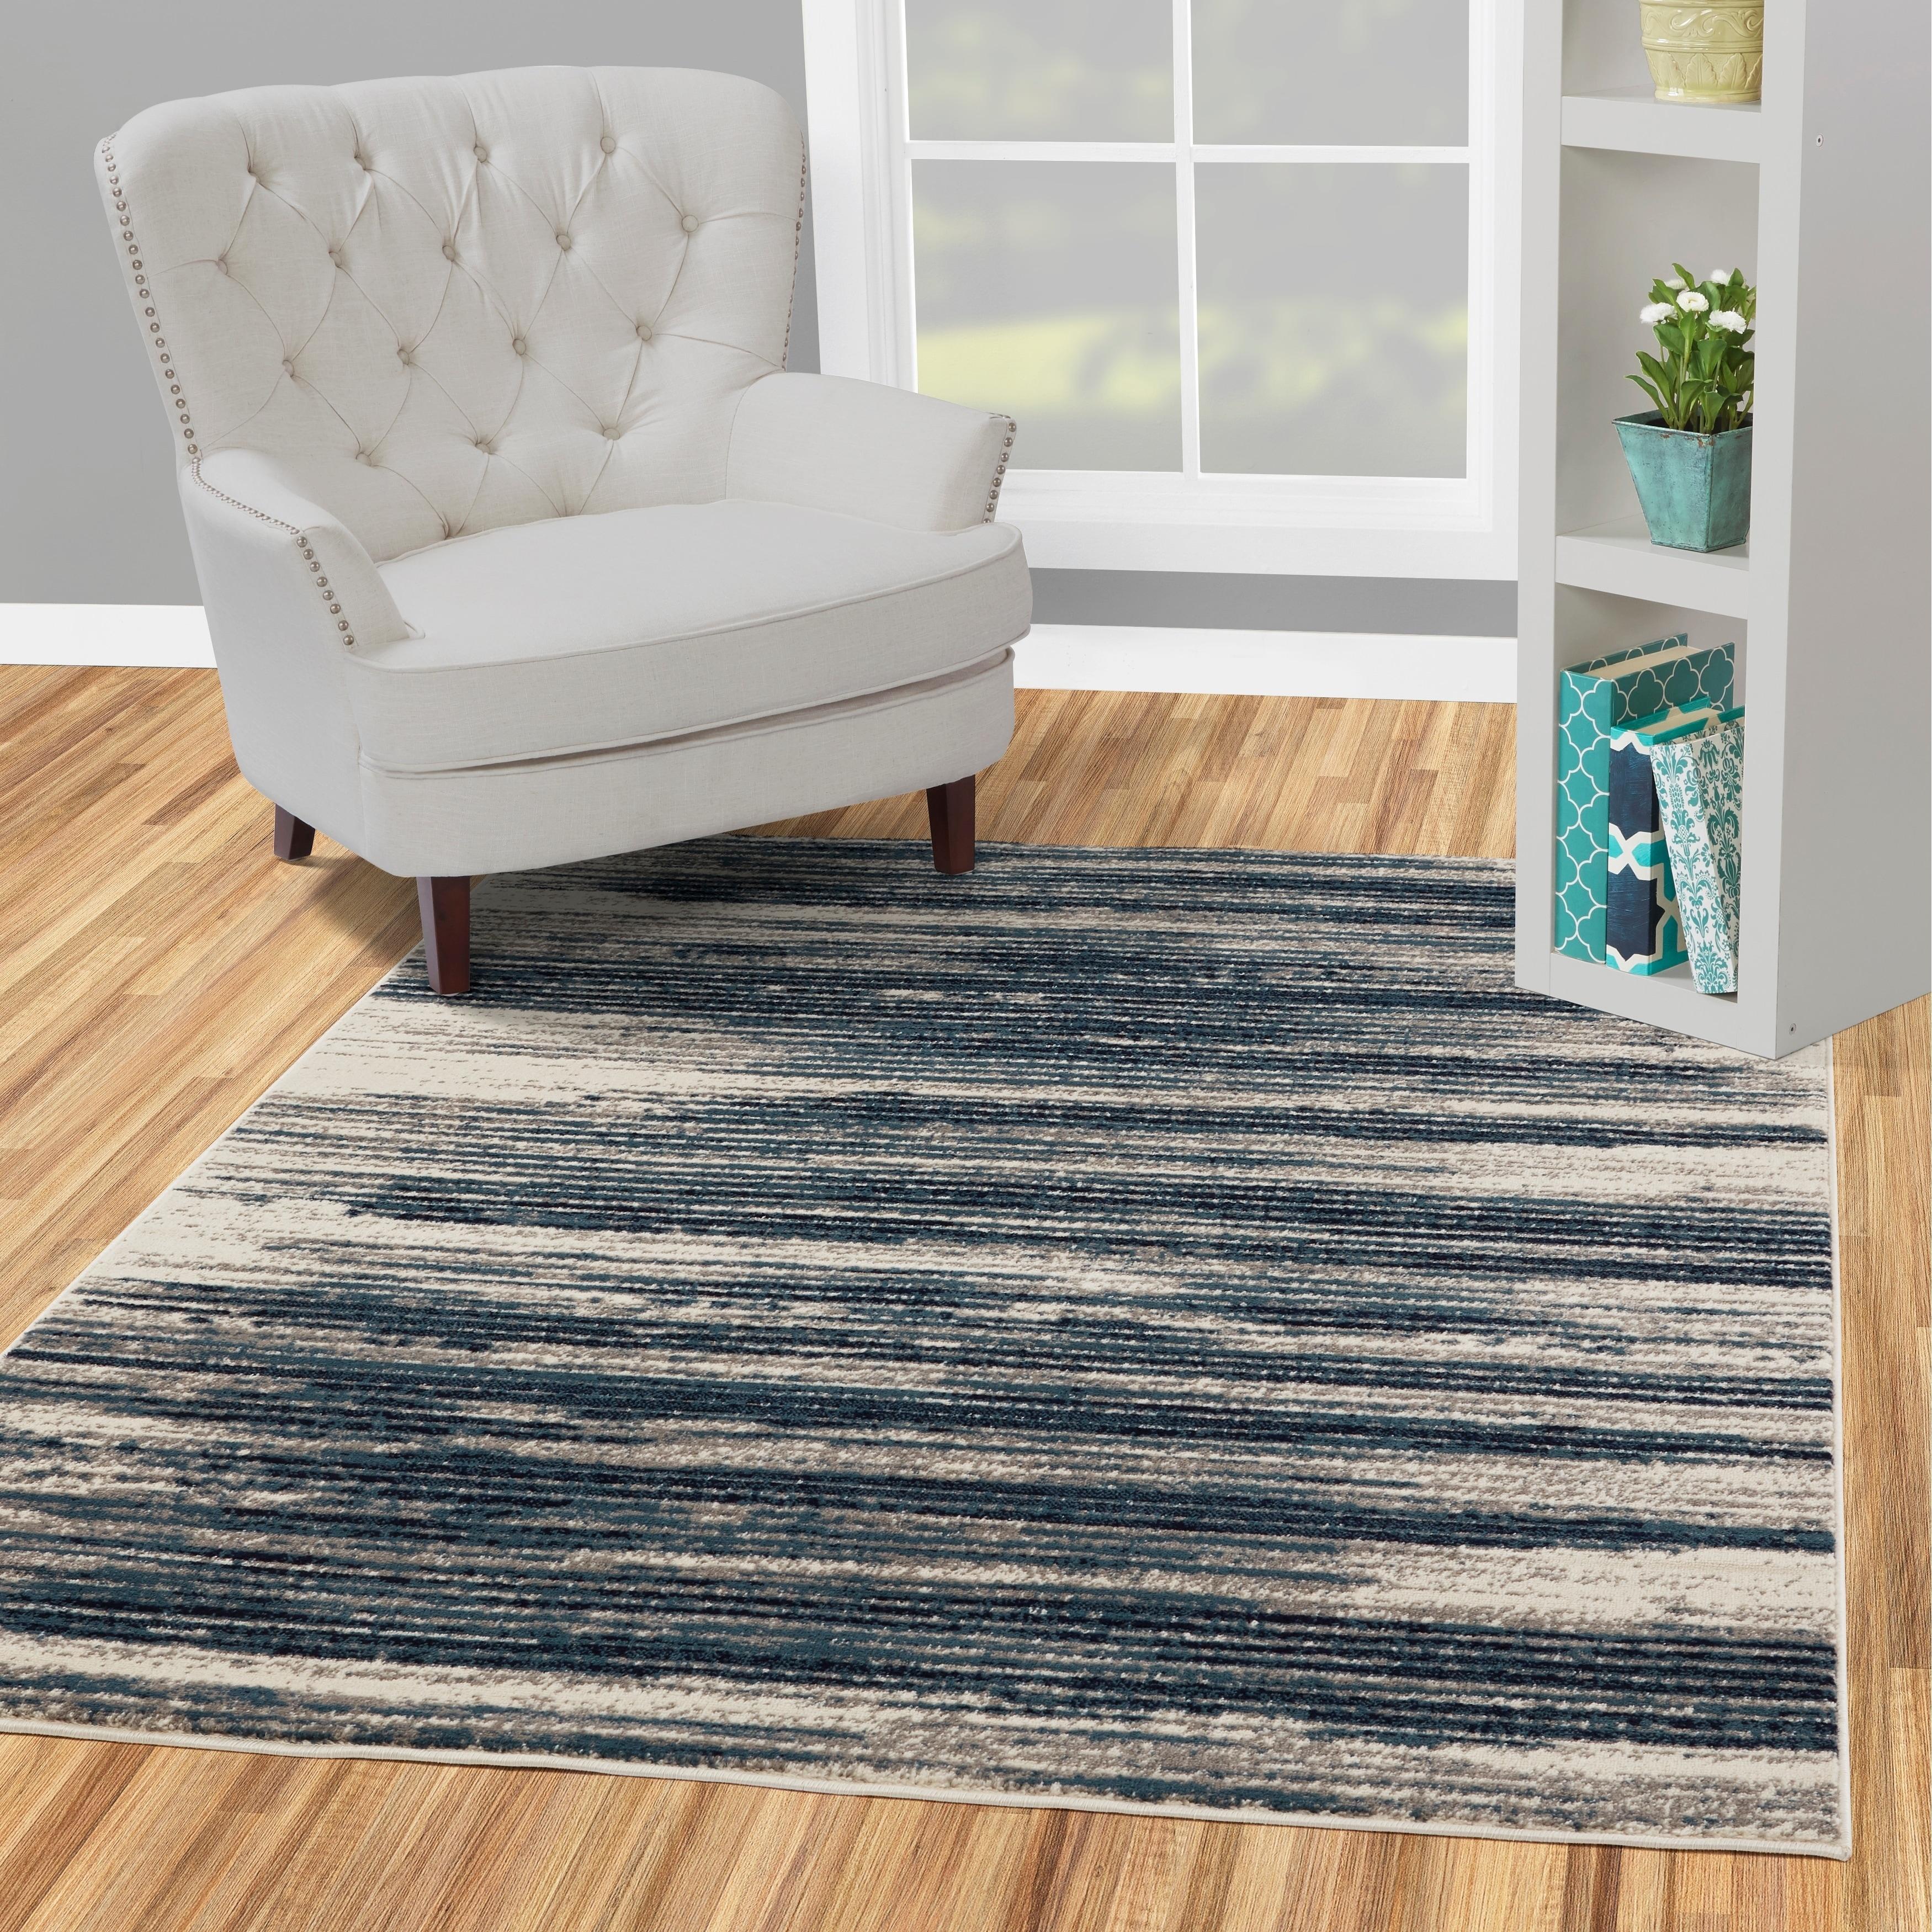 Jasmin Collection Stripes Blue and Beige Polypropylene Tea Area Rug (7'10 x  9'10) - 7'10